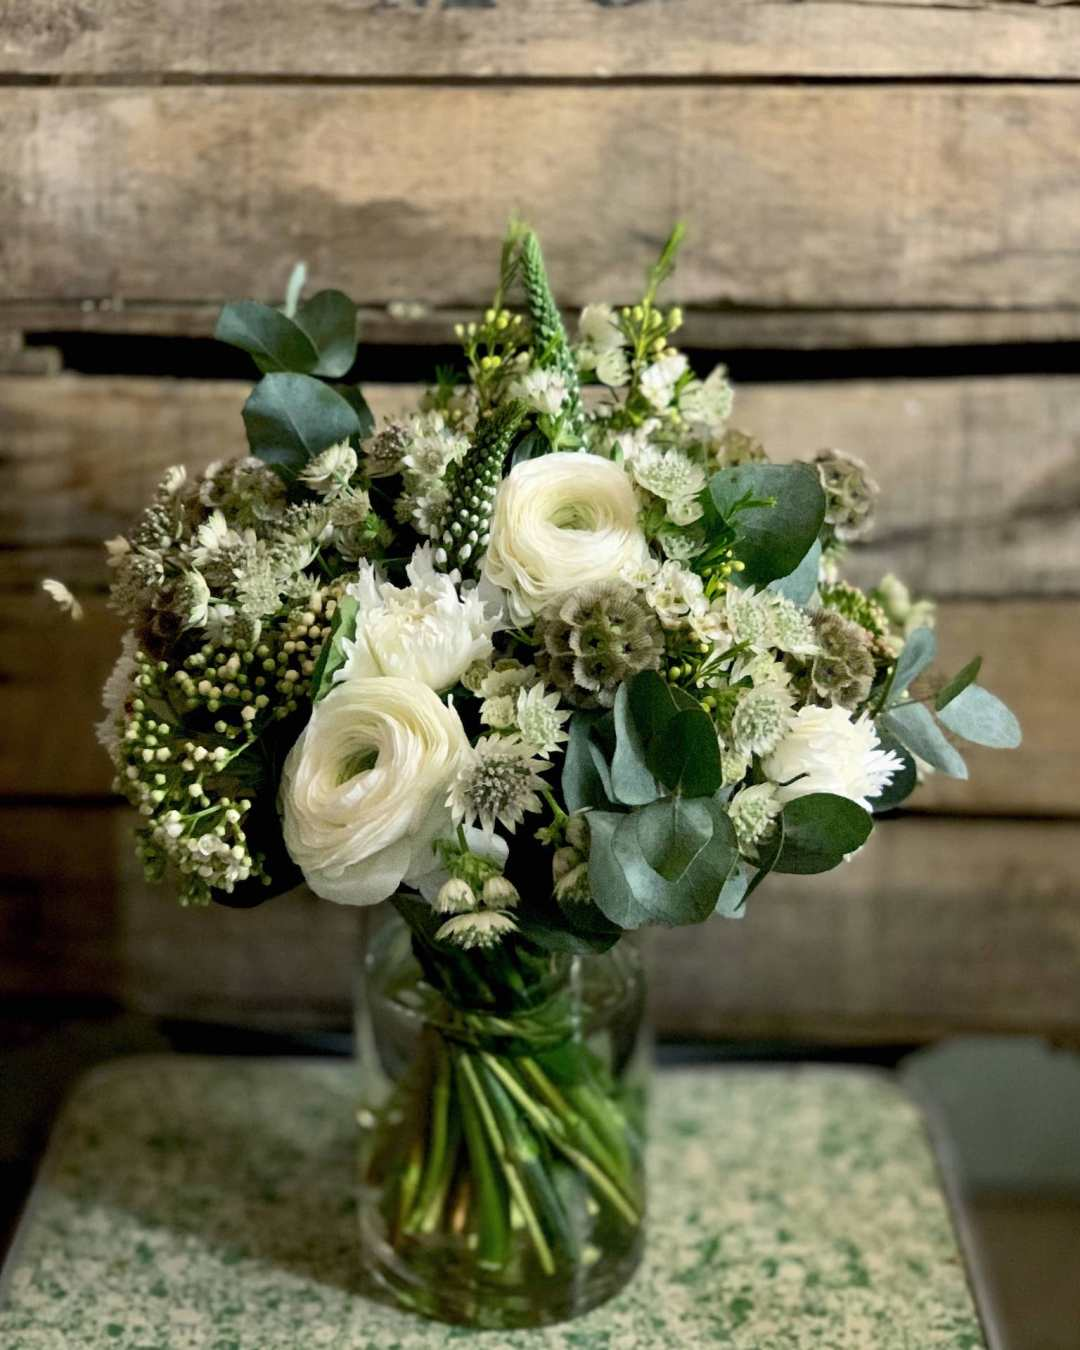 lieu-reception-champetre-pastel-hiver-mariage